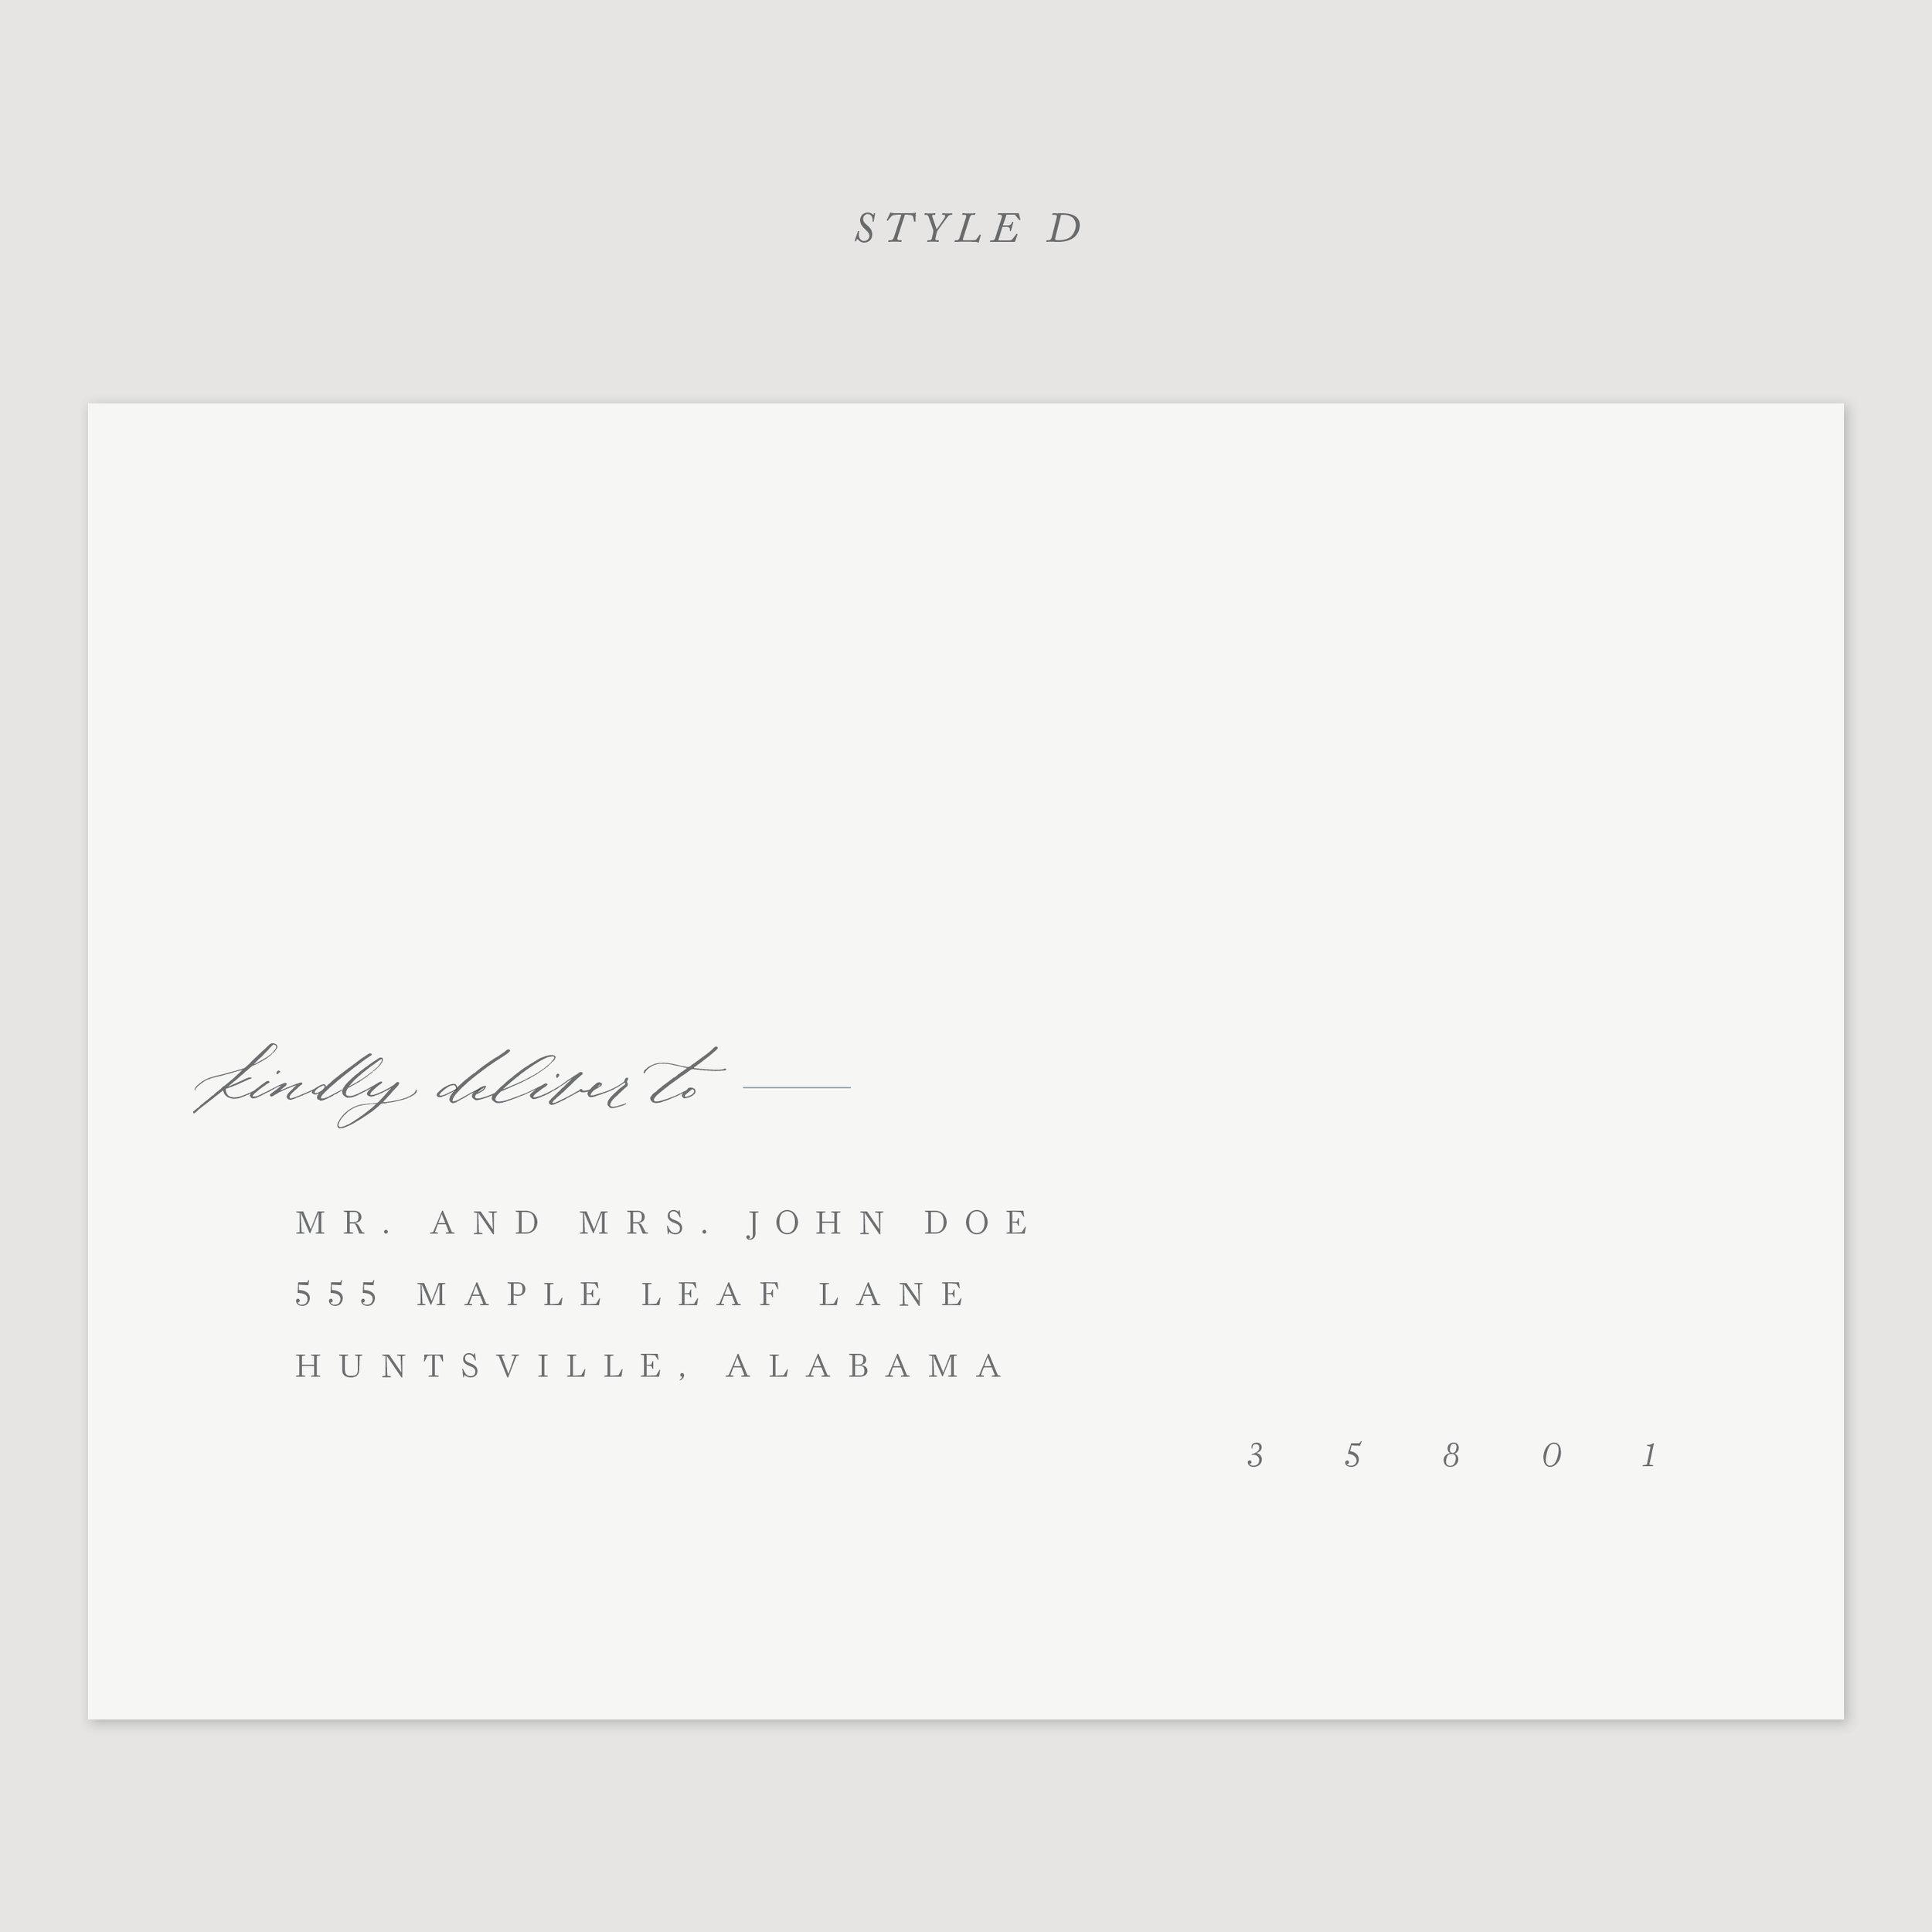 printed address styles-updated4.jpg